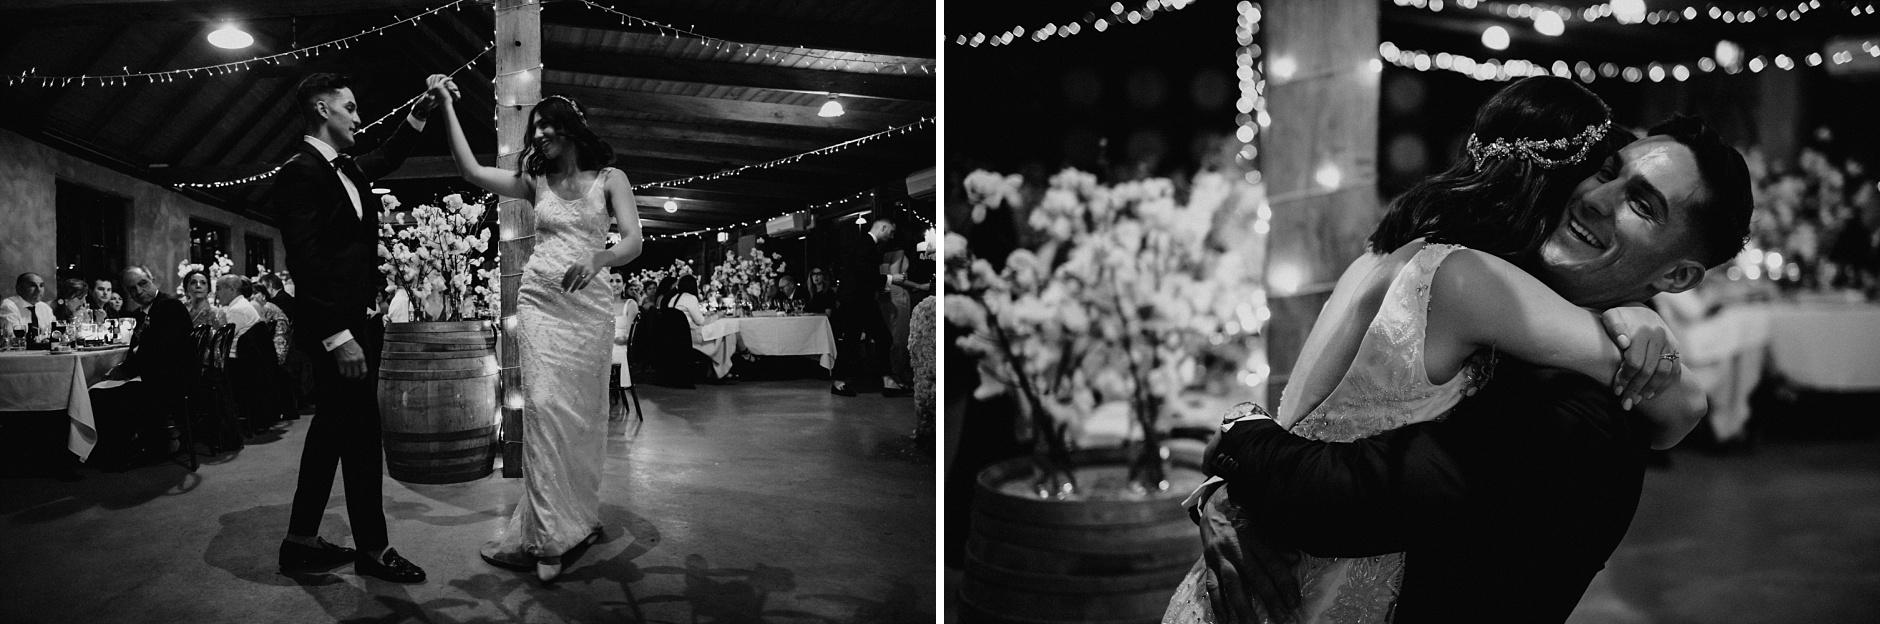 cassandra&cameron1139ab_Peppers-Creek-Wedding.jpg